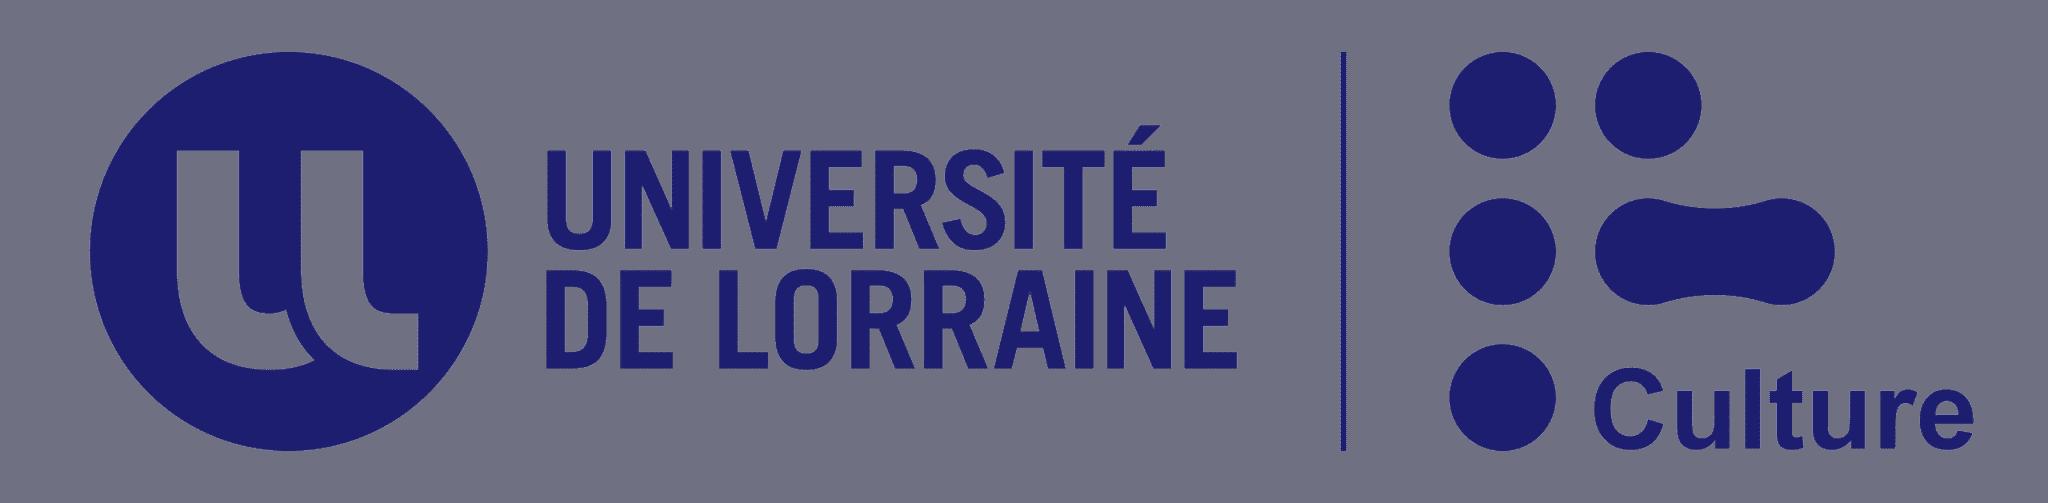 Université de Lorraine - Culture - Logo